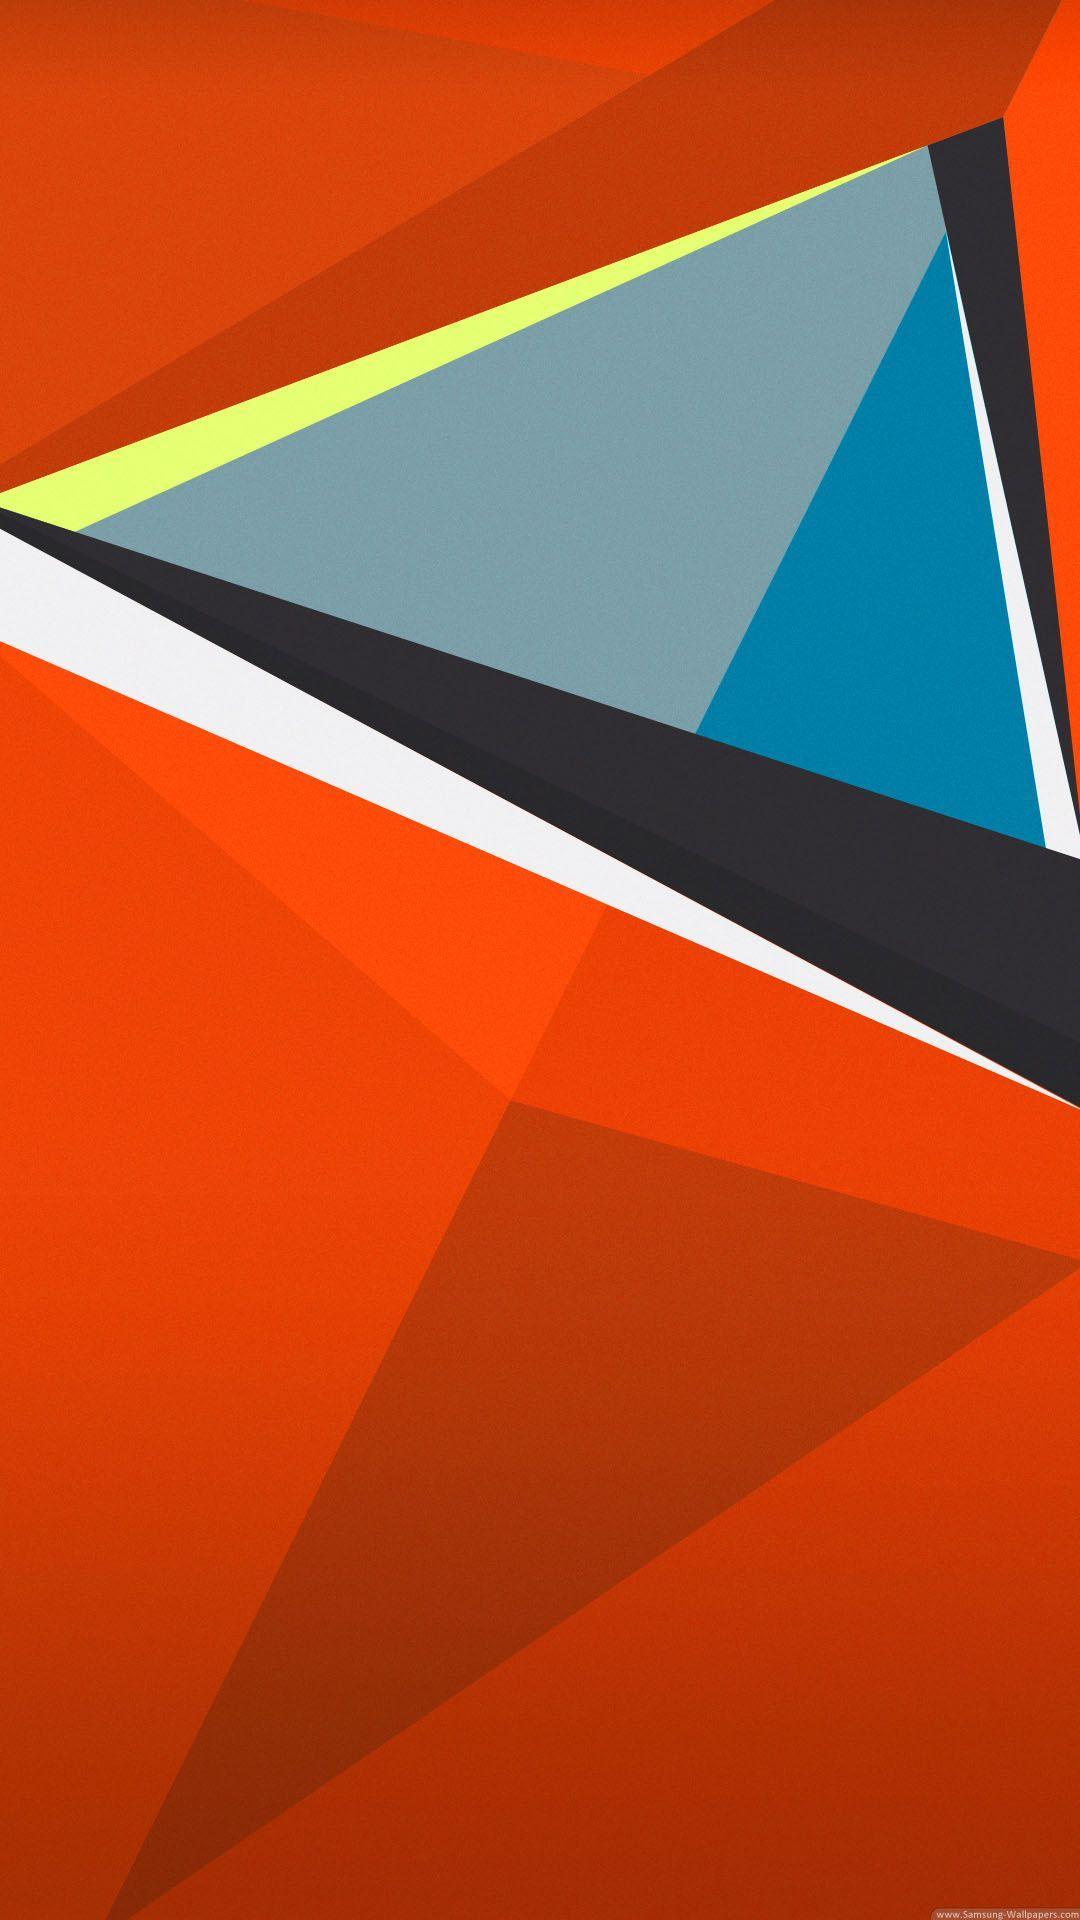 Wallpapers 1080x1920 Vertical Wallpaper Cave